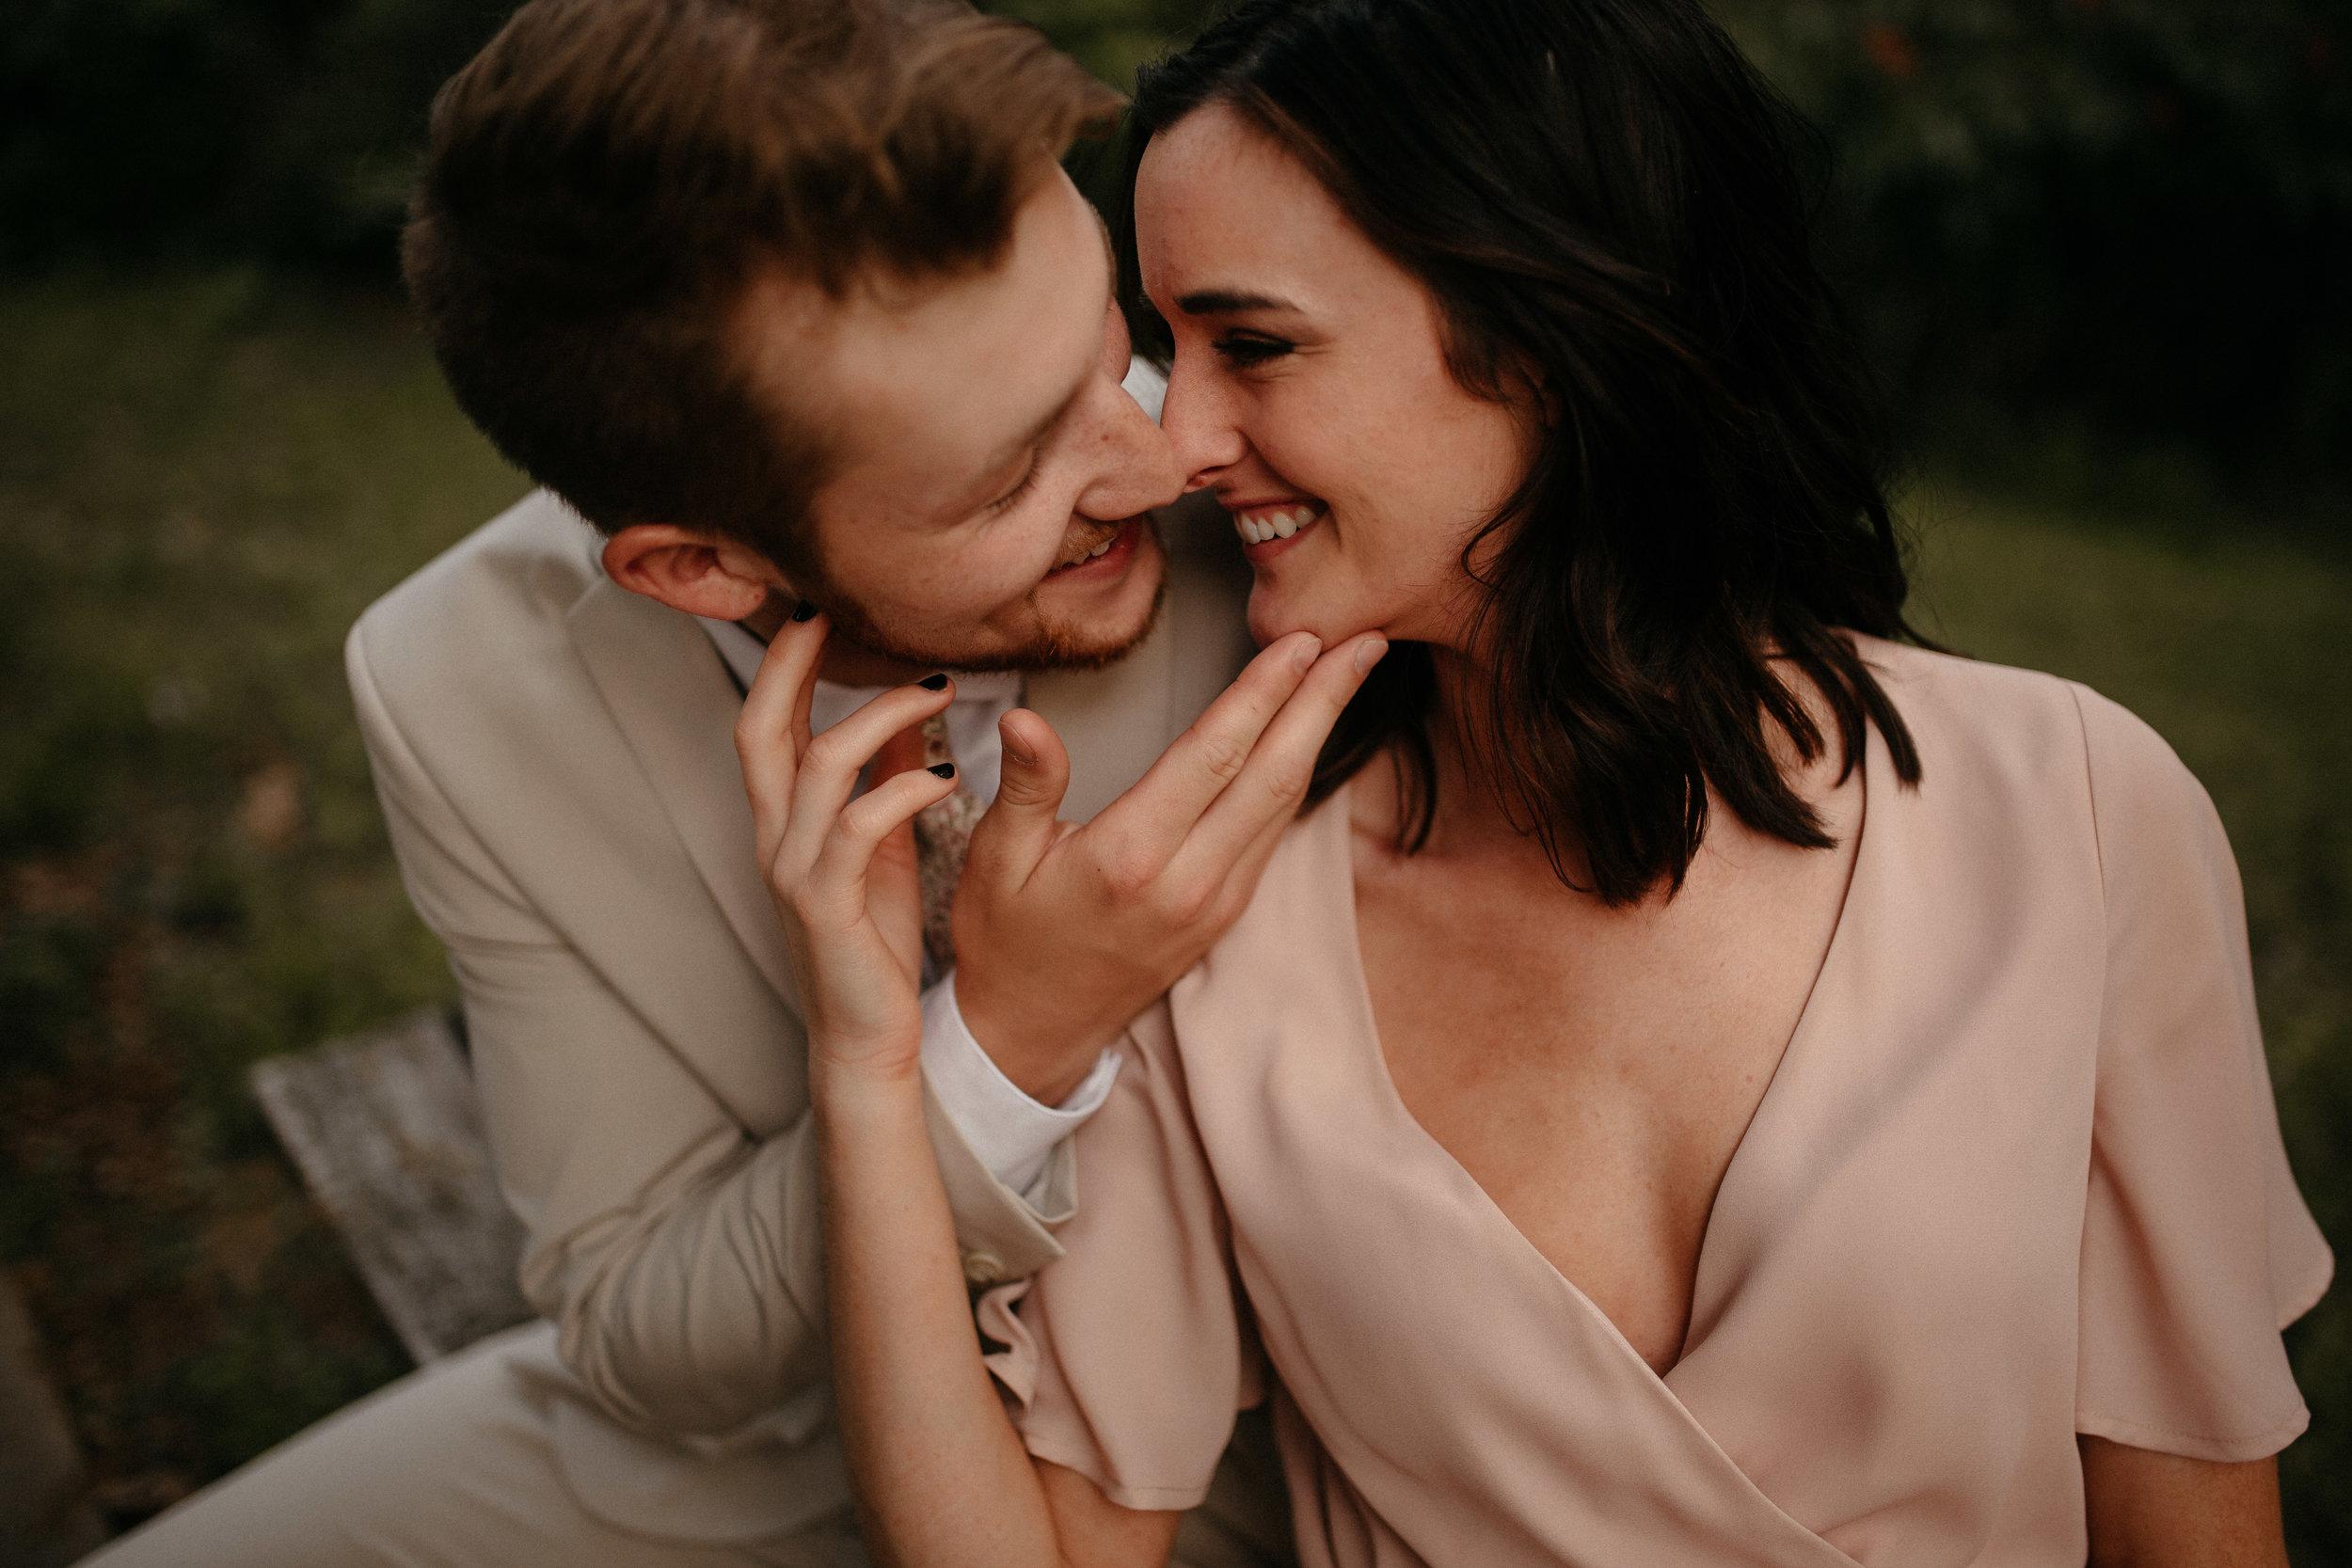 memphis-tennessee-wedding-photographer-the-hatches-utah-colorado-washington-arizona-oregon-yosemite-national-park-elopement-adventure-emotional-journalistic